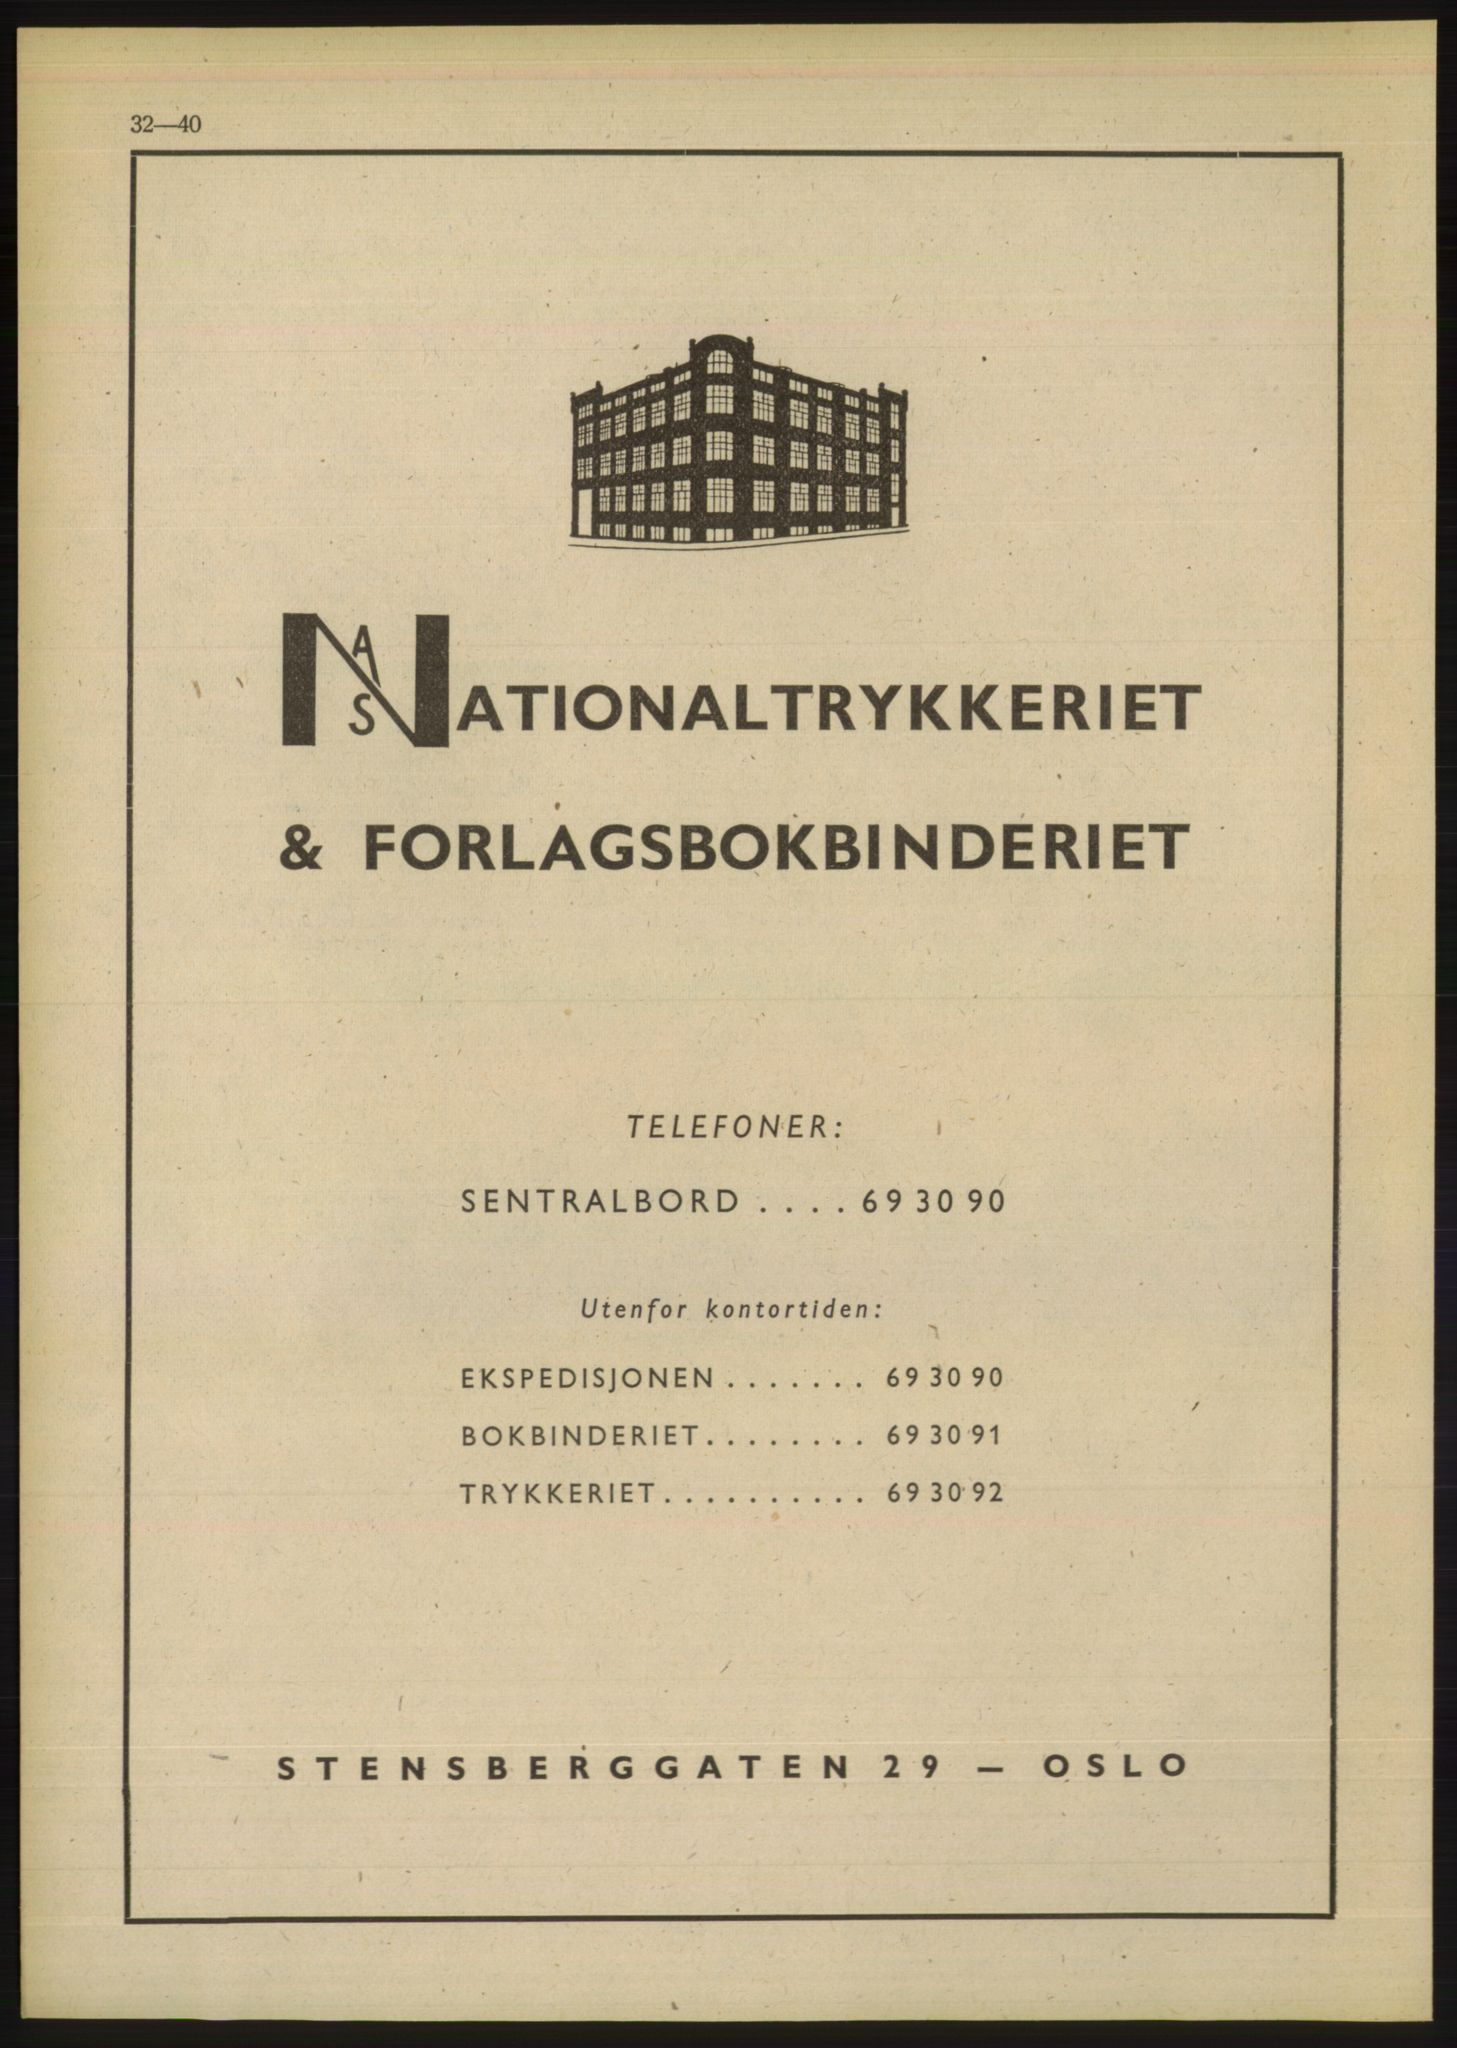 PUBL, Kristiania/Oslo adressebok, 1948, p. 32